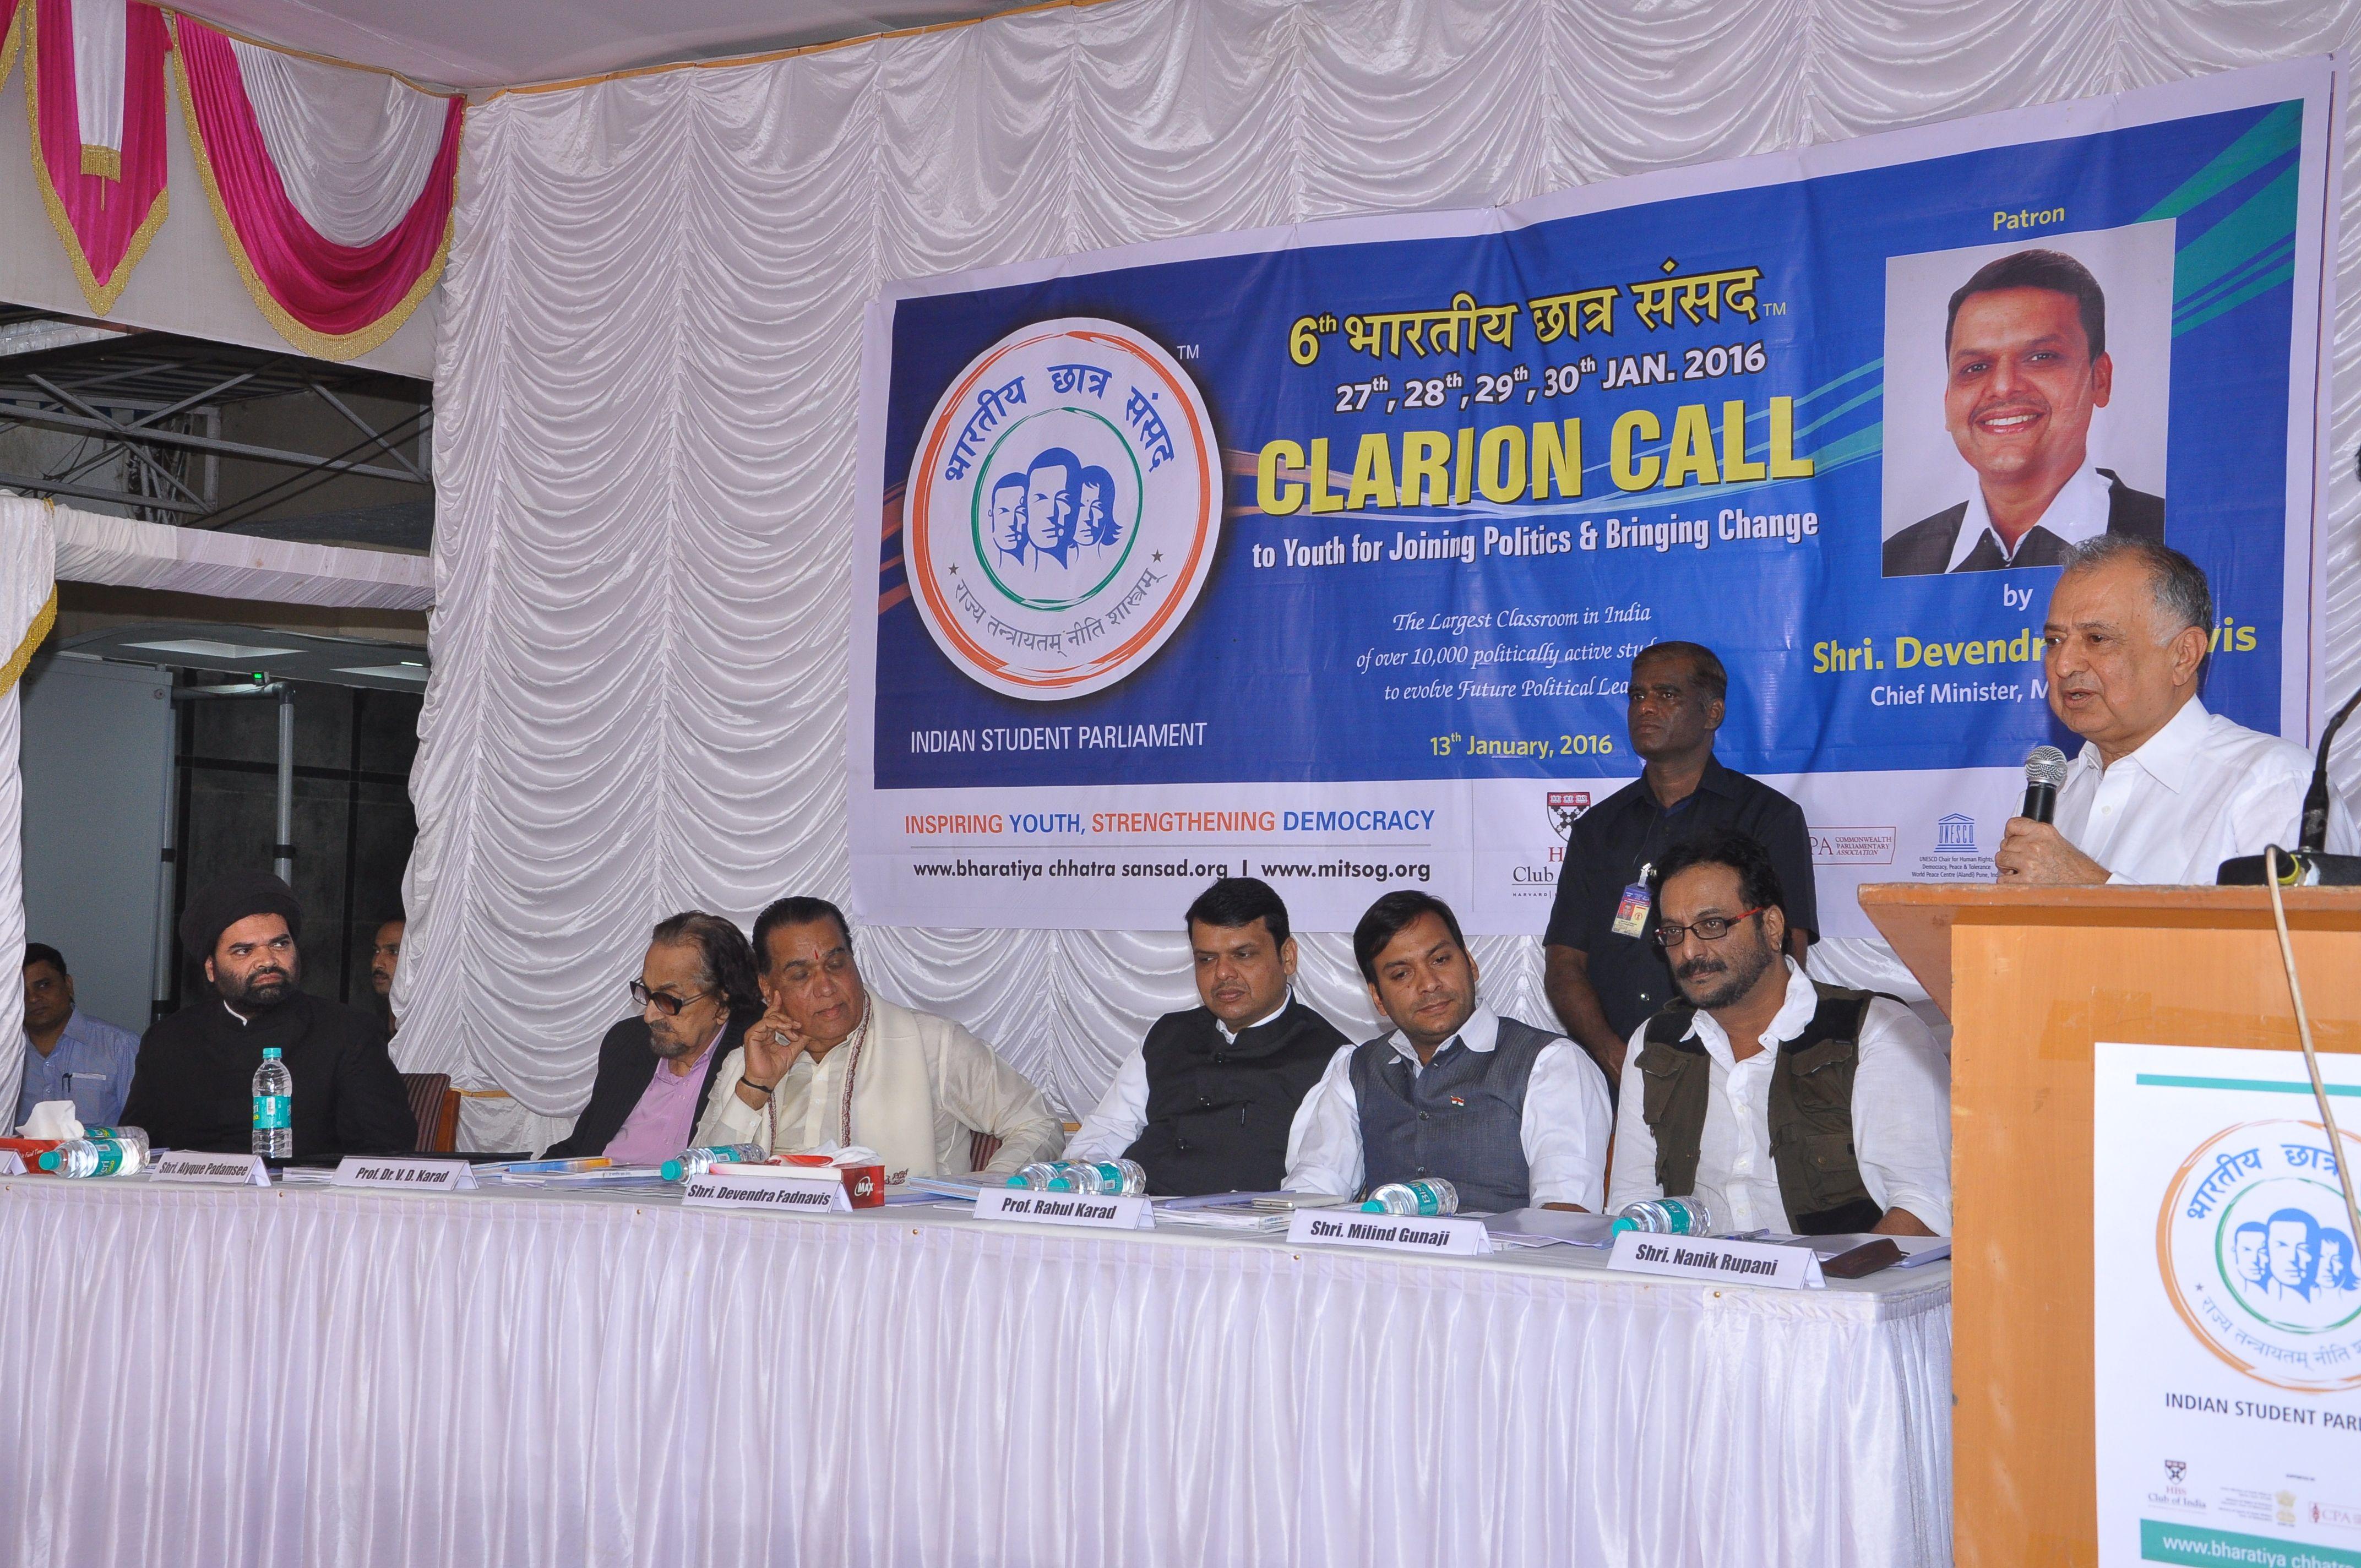 Clarion Call of 6th Bharatiya Chhatra Sansad Function